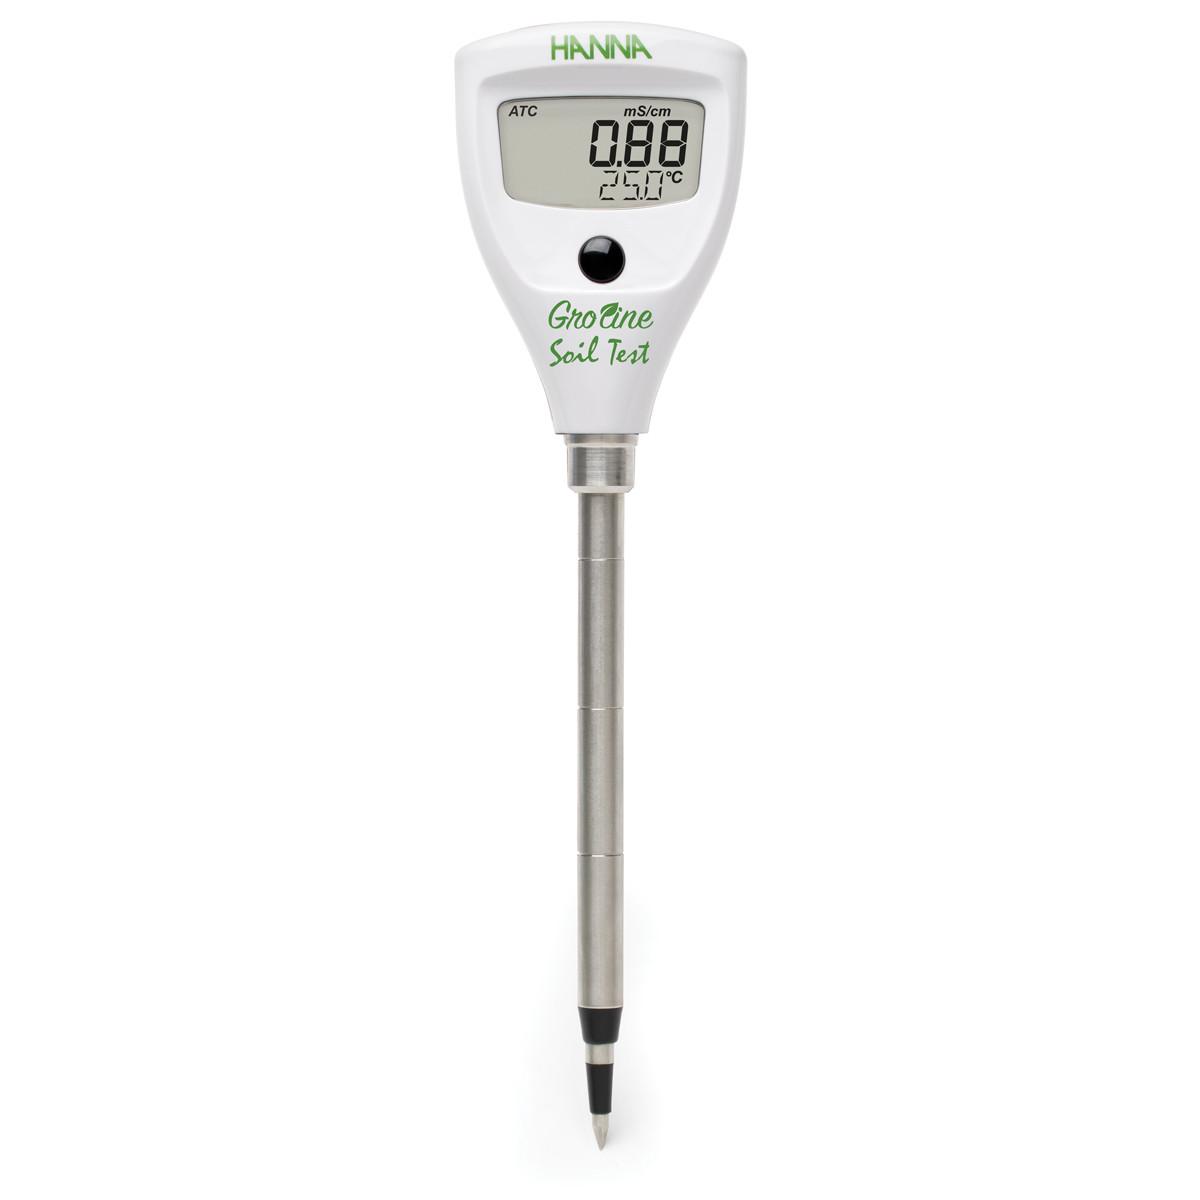 Soil Test™ Direct Soil Conductivity Tester